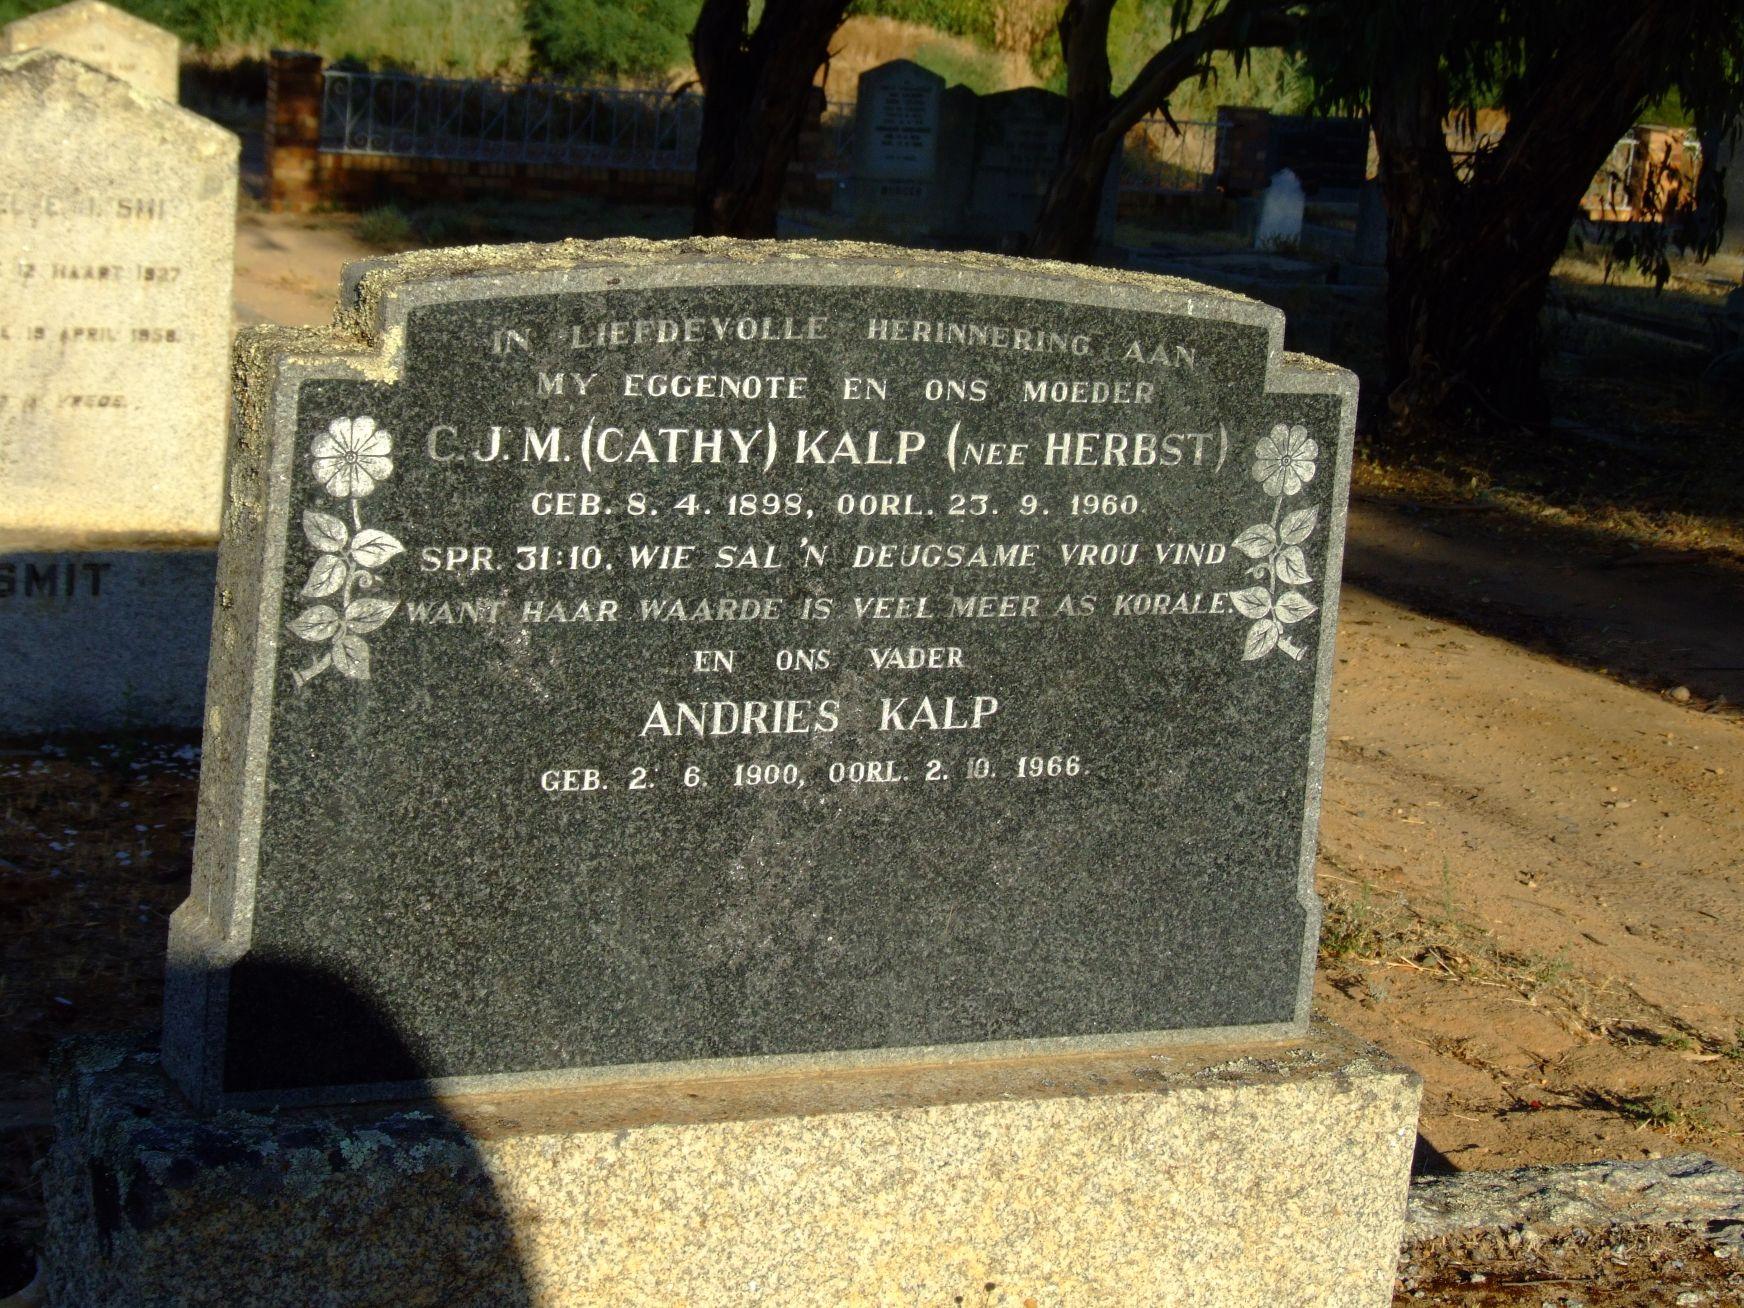 Kalp, Andries + Kalp C. J. M.